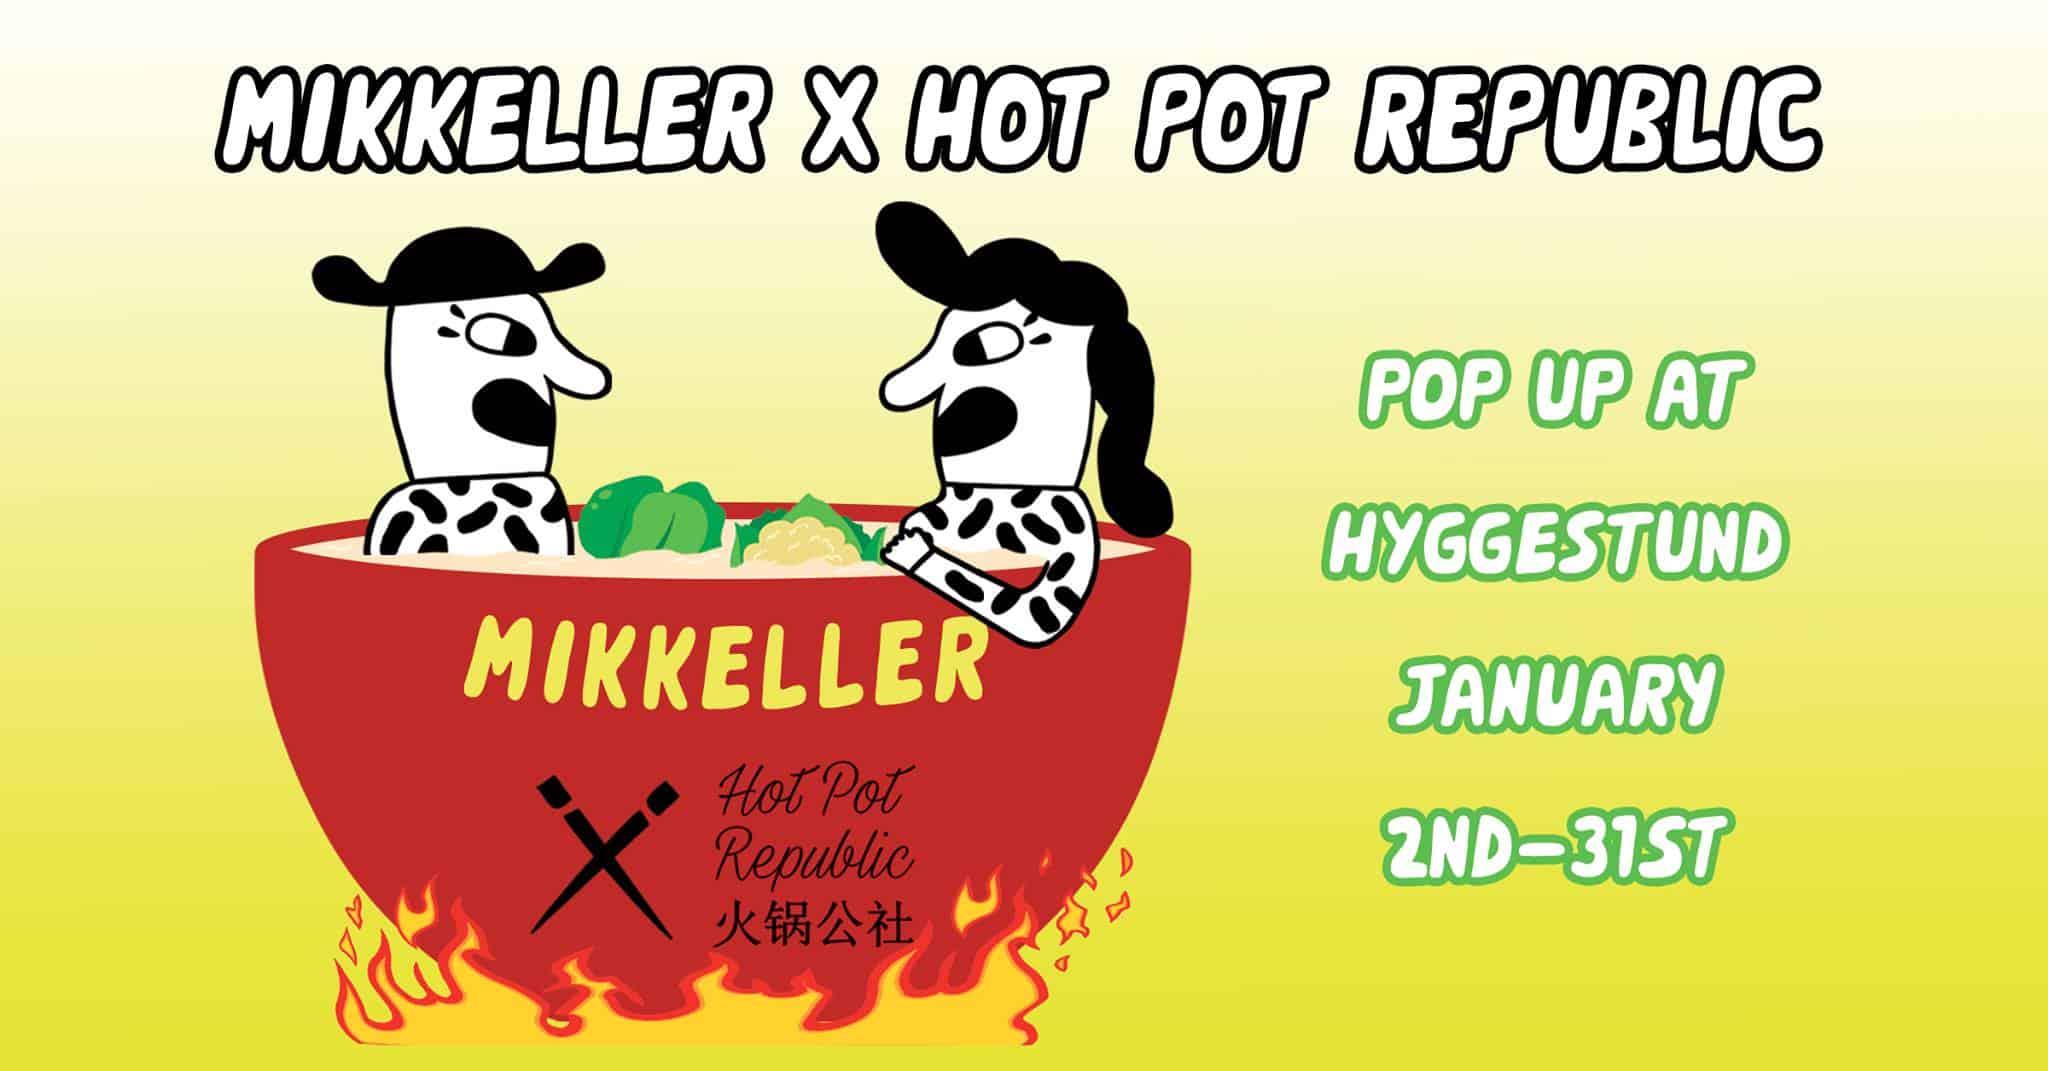 Photo credit: Mikkeller x Hot Pot Republic